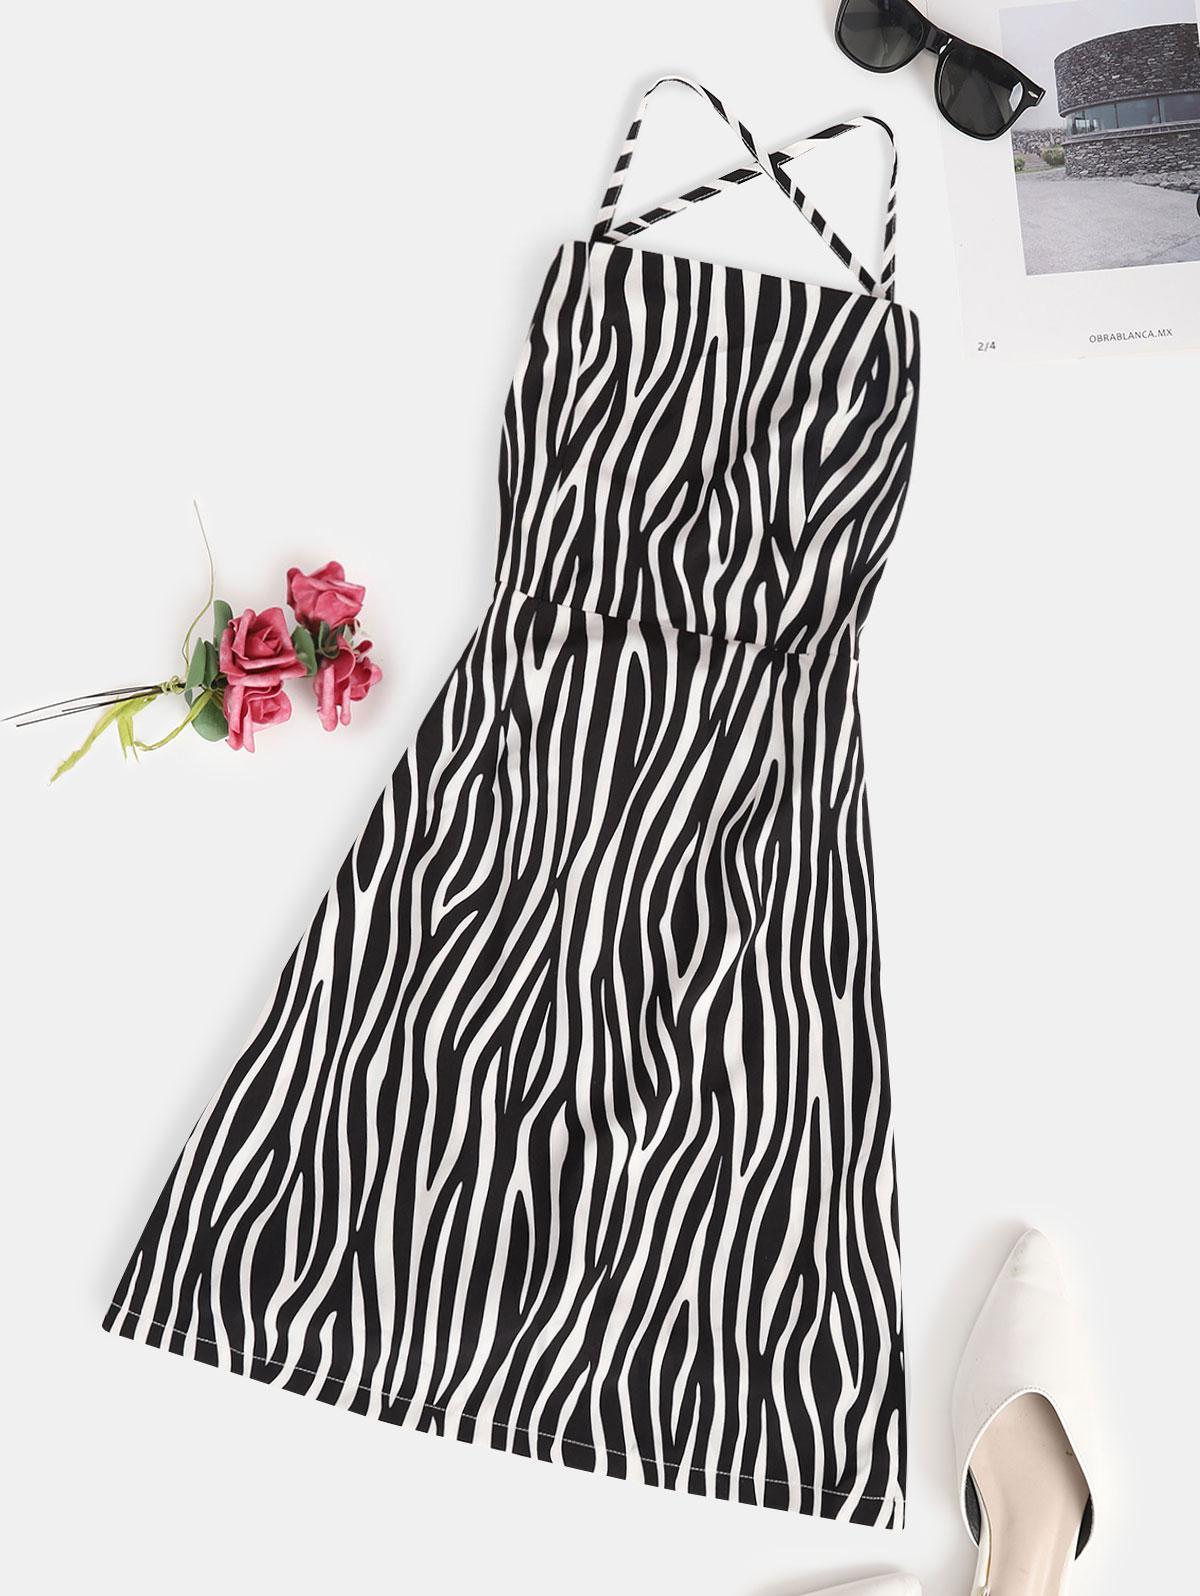 Zaful Zebra Print Dress